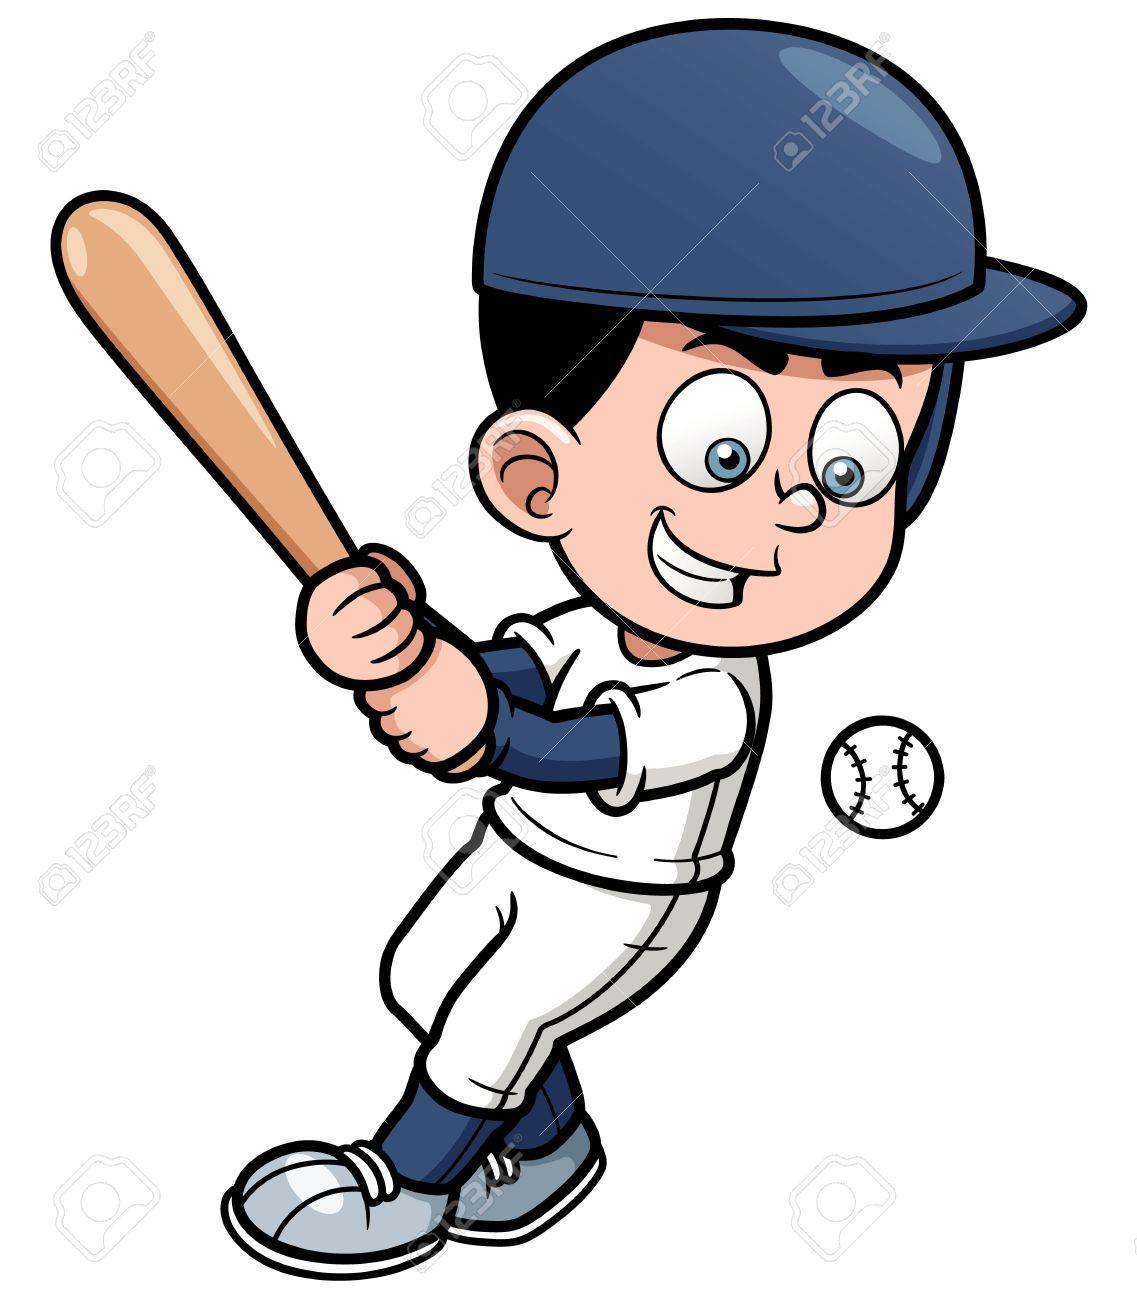 illustration of Cartoon Baseball Player.